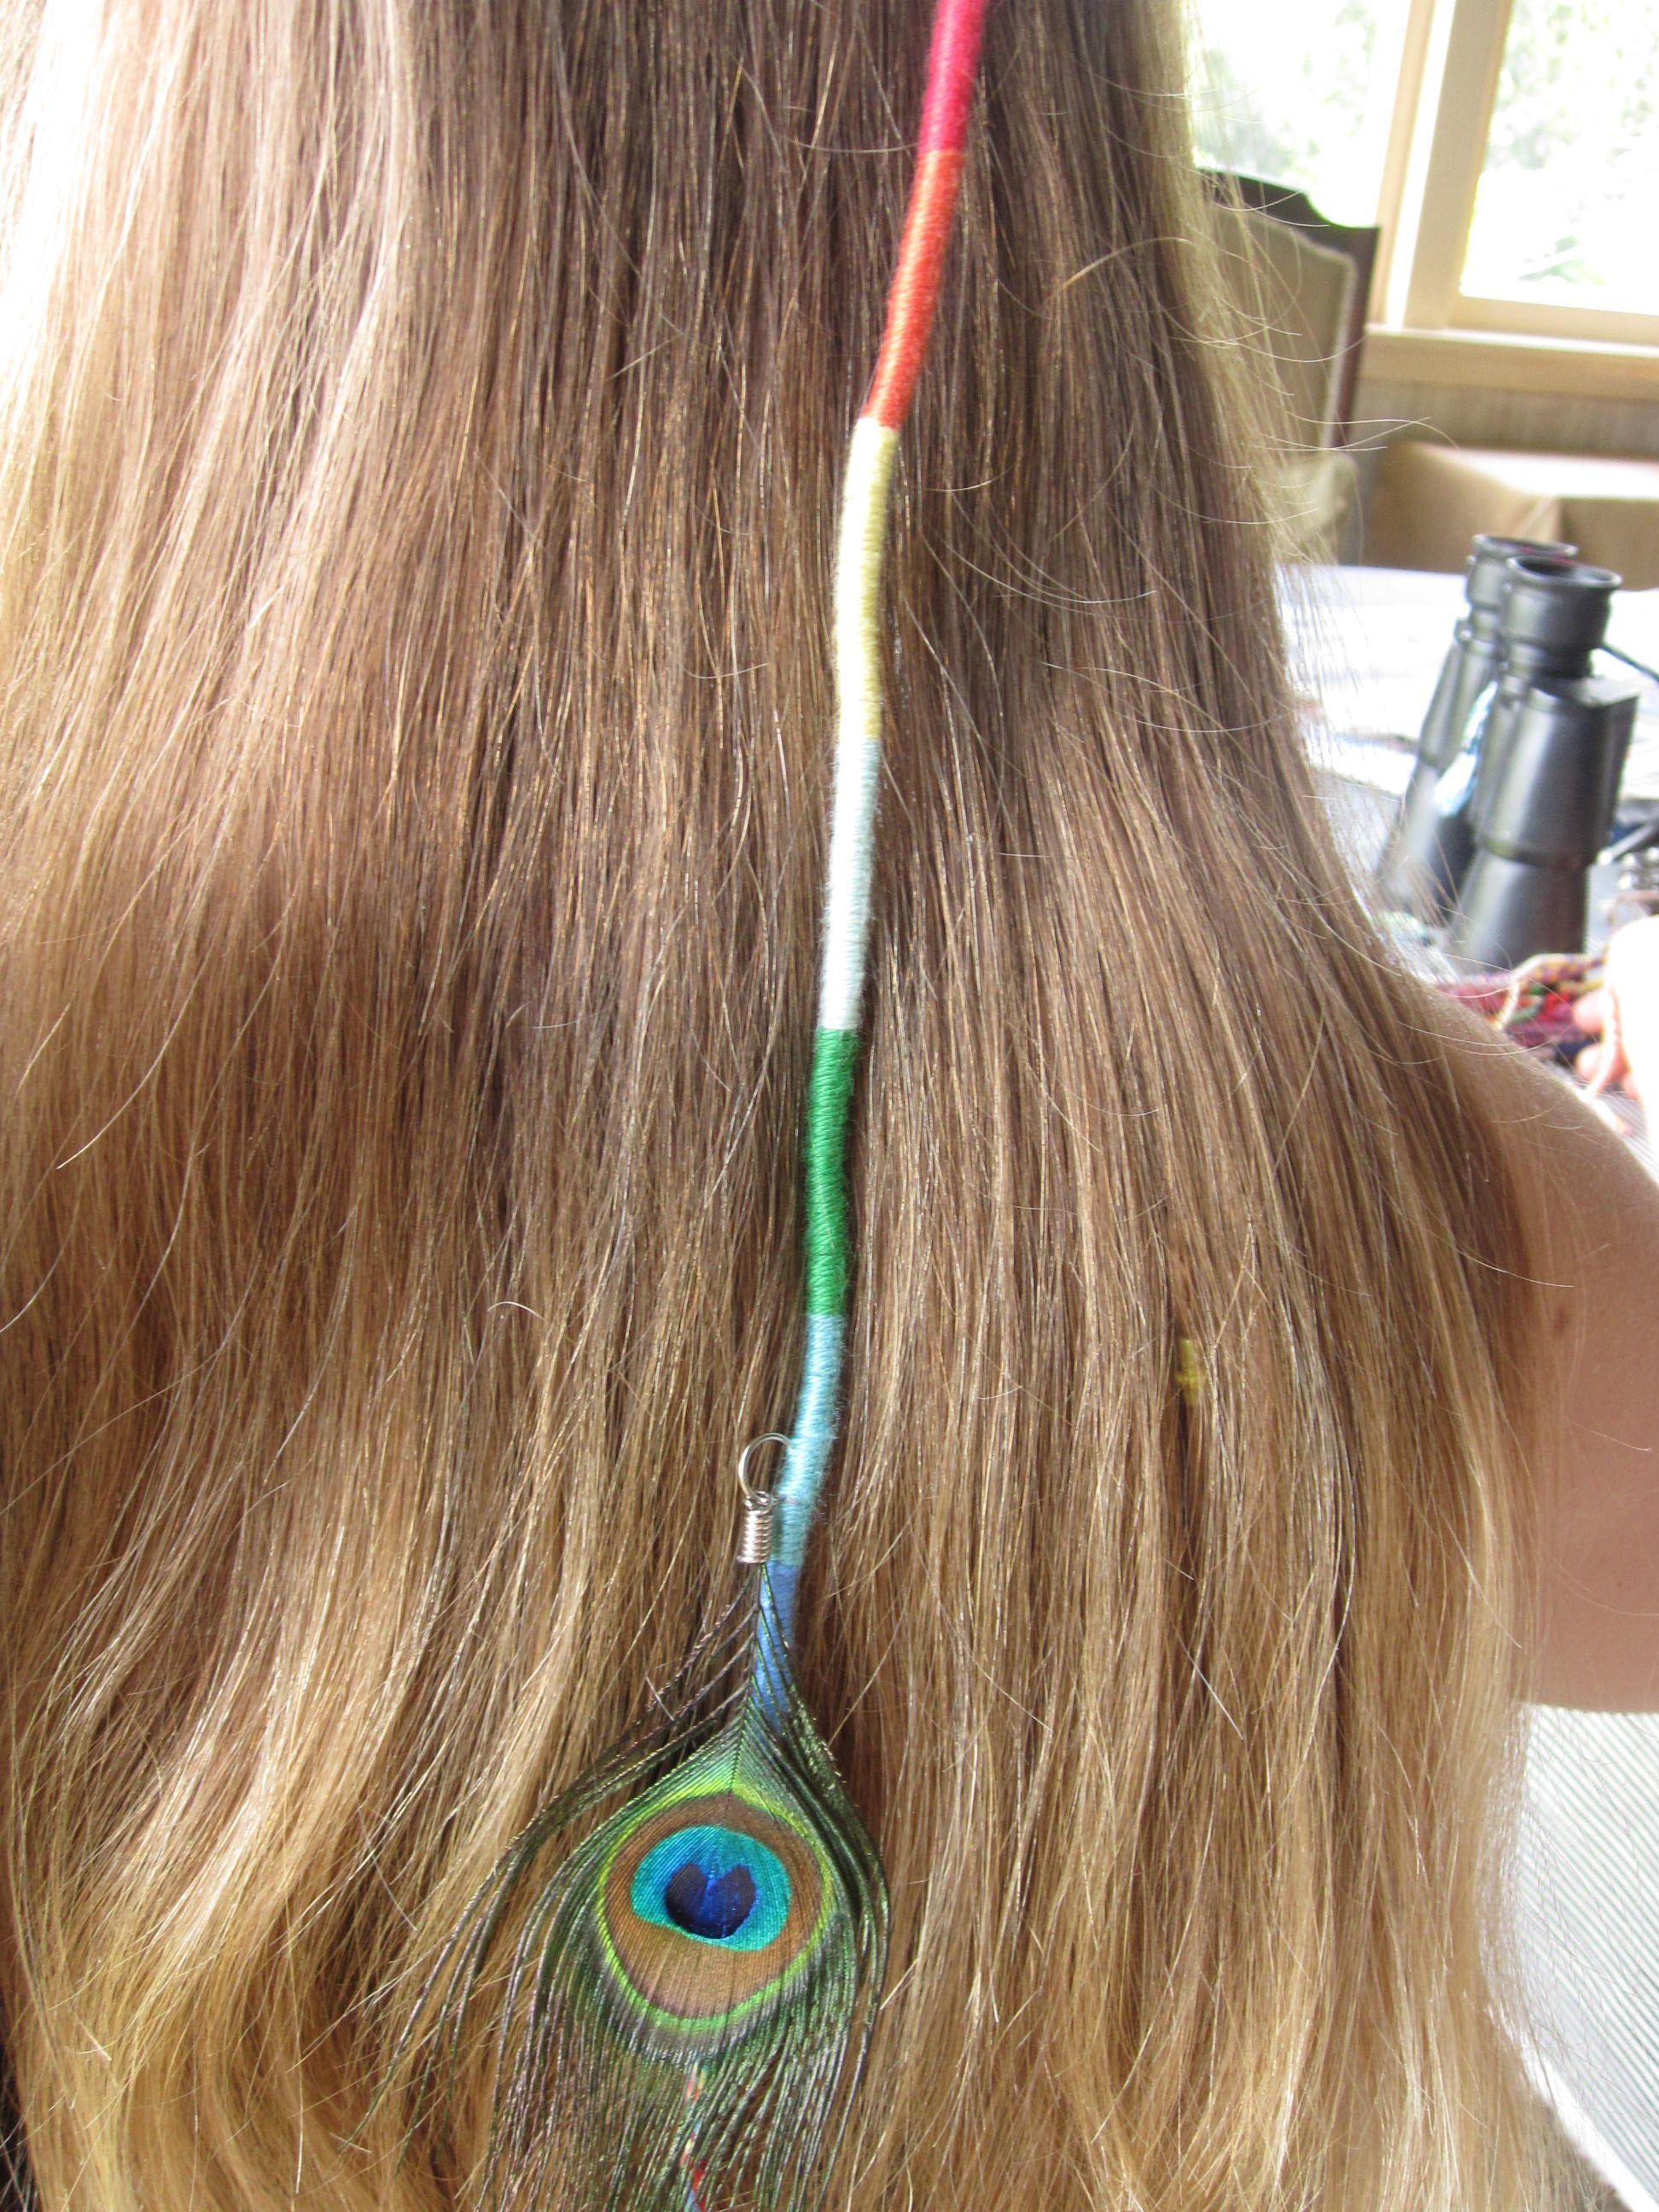 Pin By Island Hair Braids Nz On Hair Wraps Feathered Hairstyles Hair Beauty Hair Wrap Diy